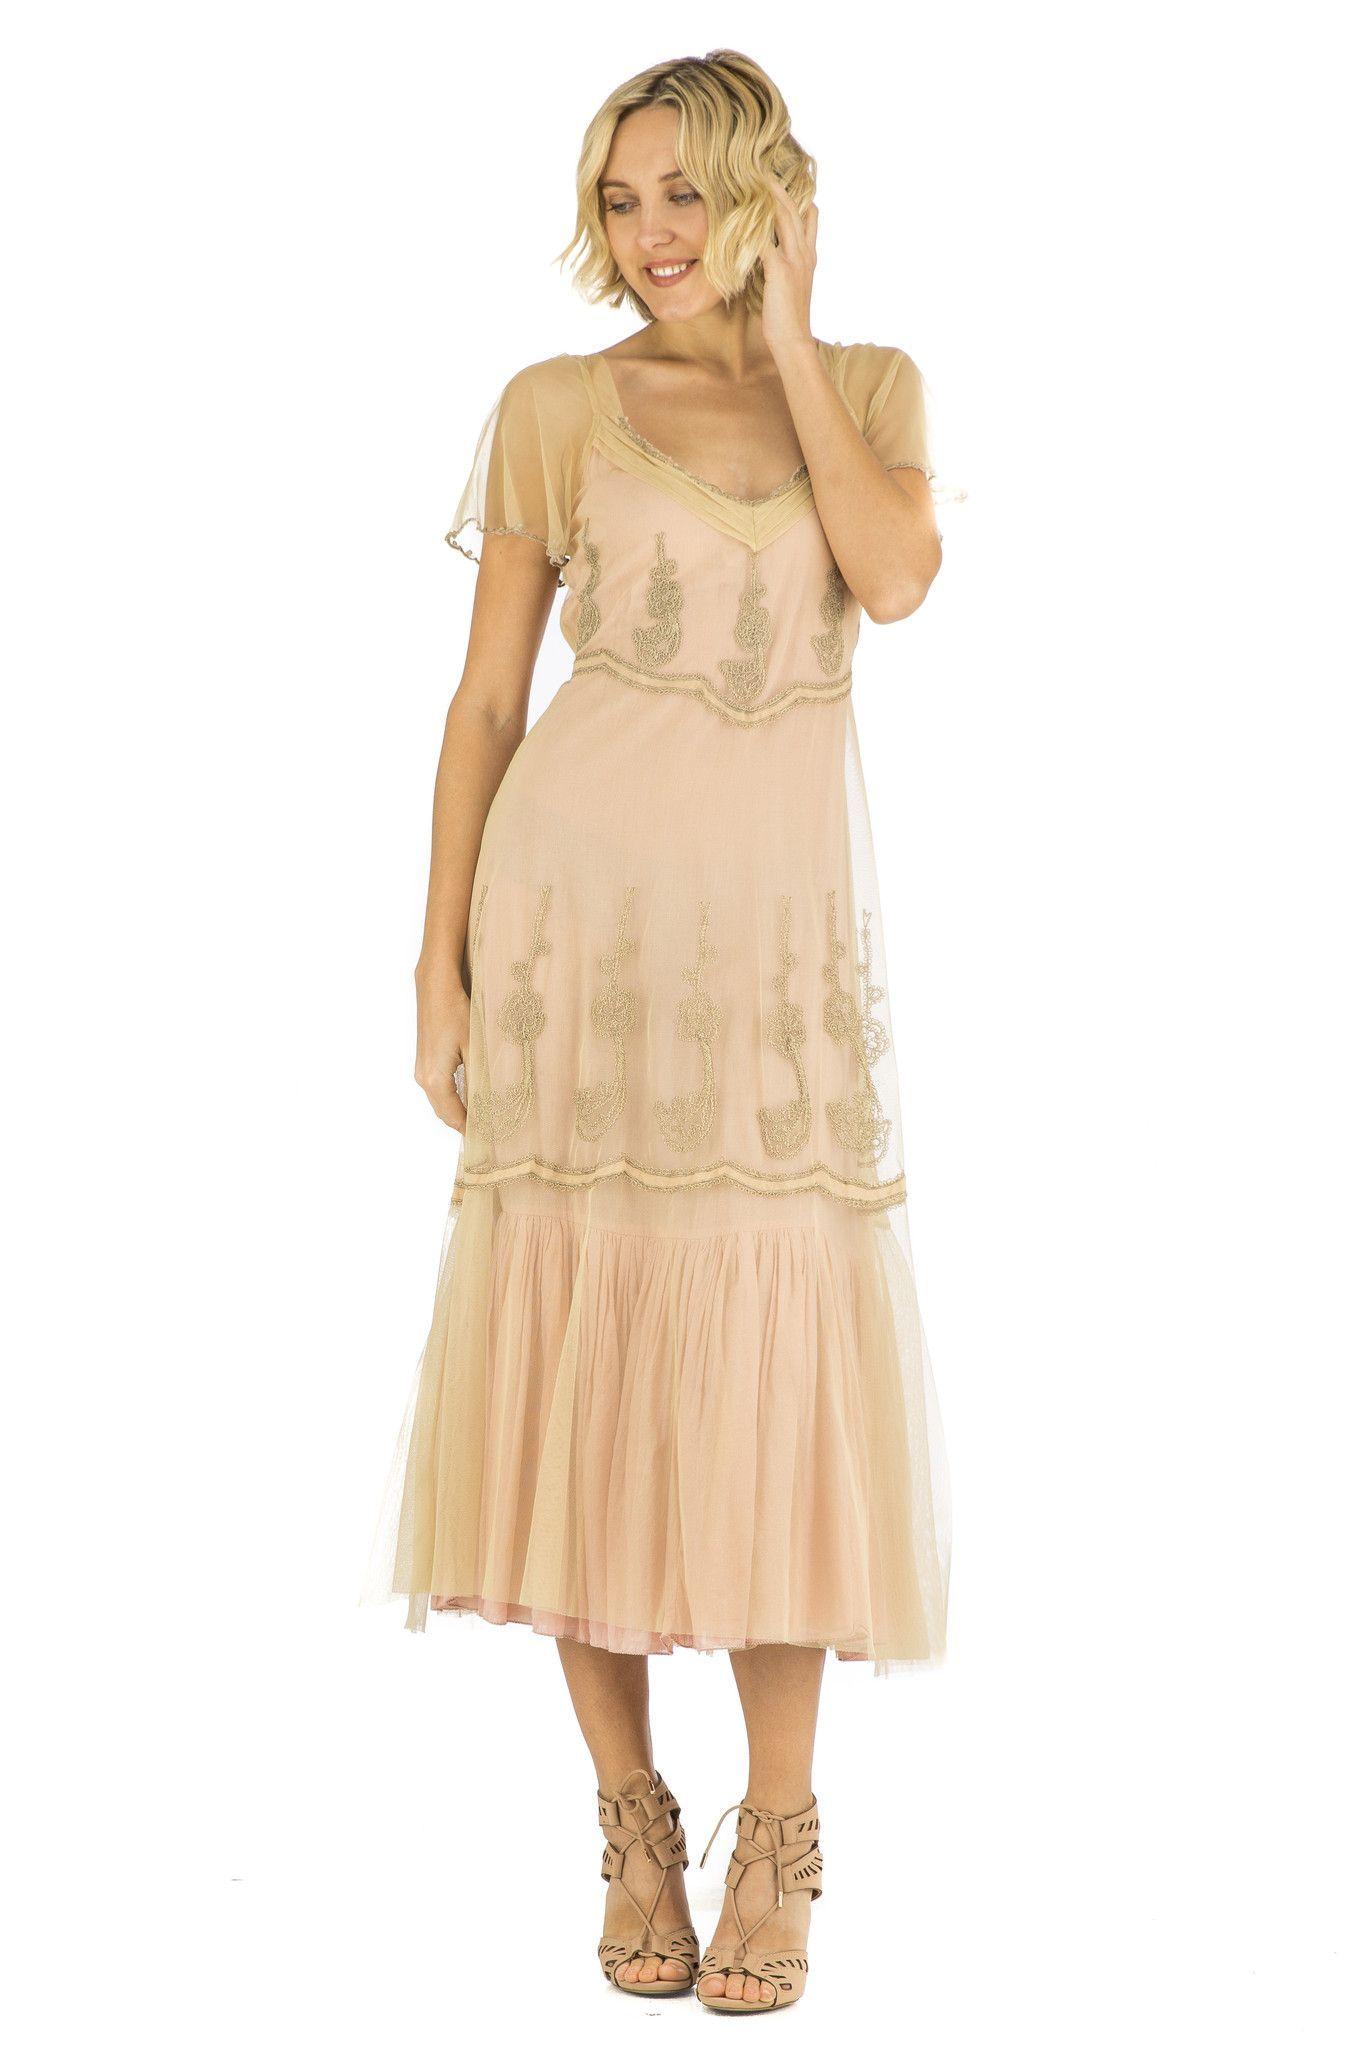 Peach dress for wedding guest  Whimsical Elegance Peach Maxi Dress  Products  Pinterest  Peach